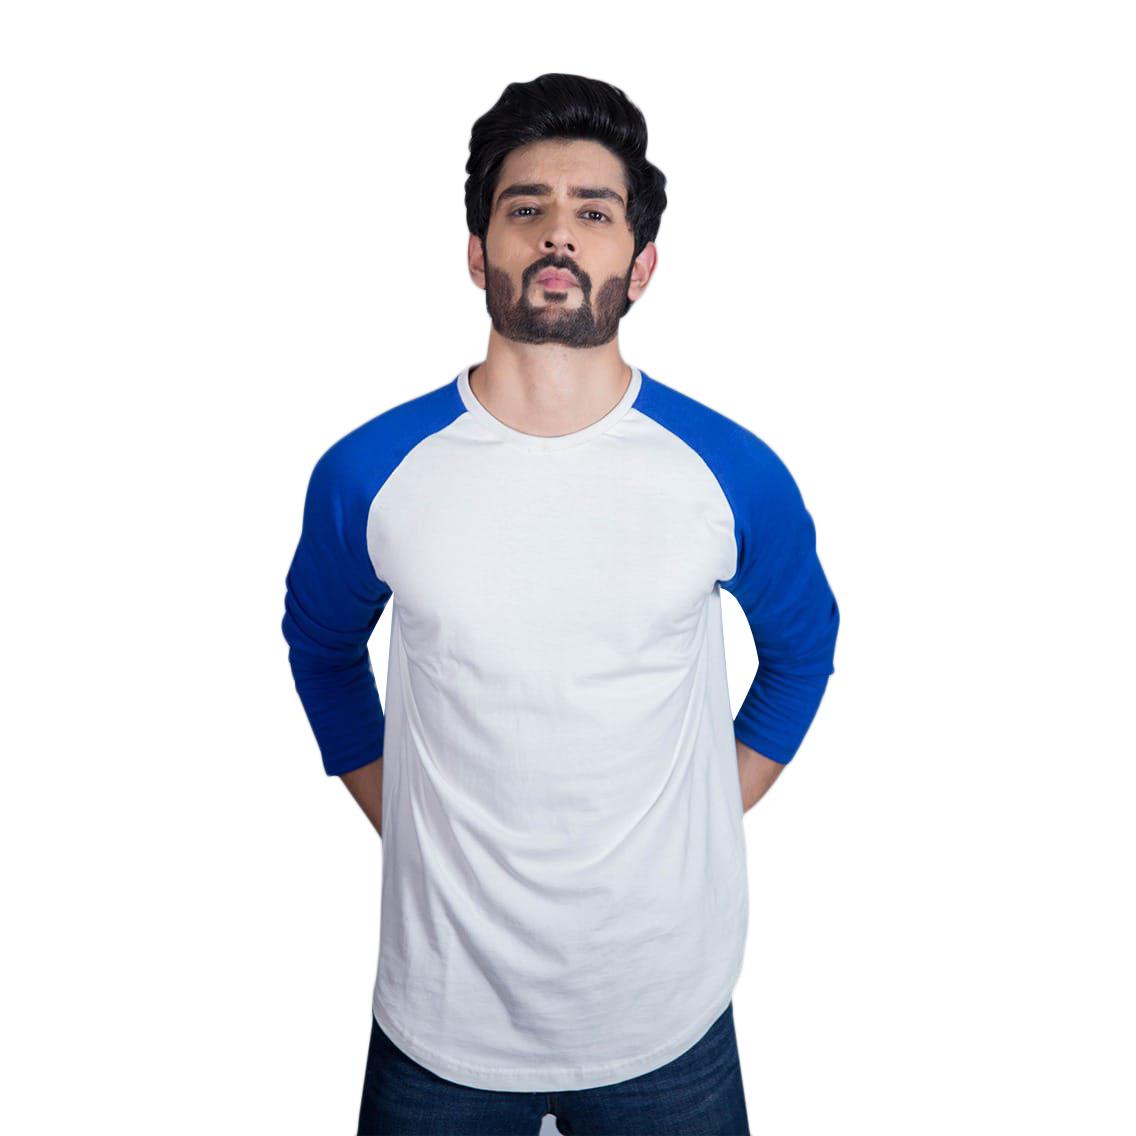 Surteez Raglan Full Sleeve tshirts for men- Soft Jersey Cotton long sleeves t shirt for men | Black White Raglan t shirt | Navy  Blue Grey Raglan